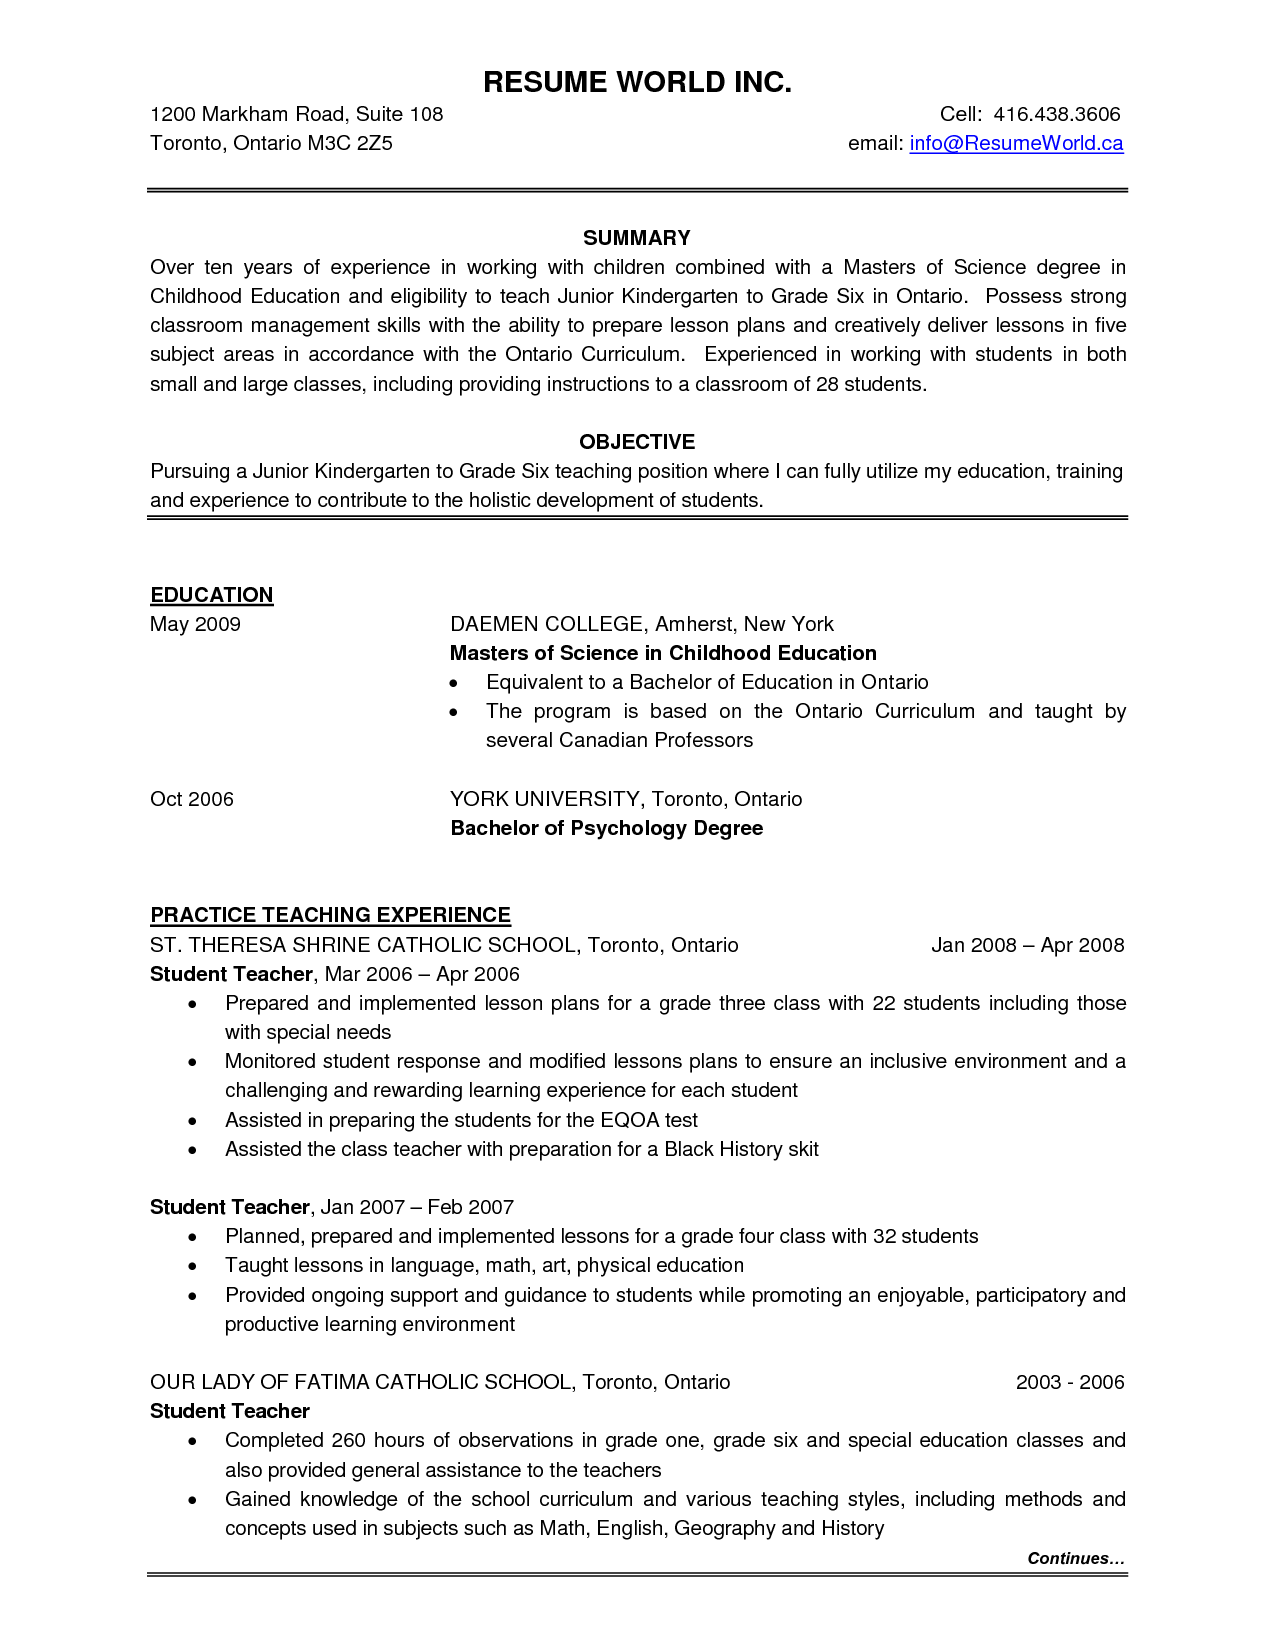 Canadian Resume Template Sample Best Resumes Dream Job Hunts